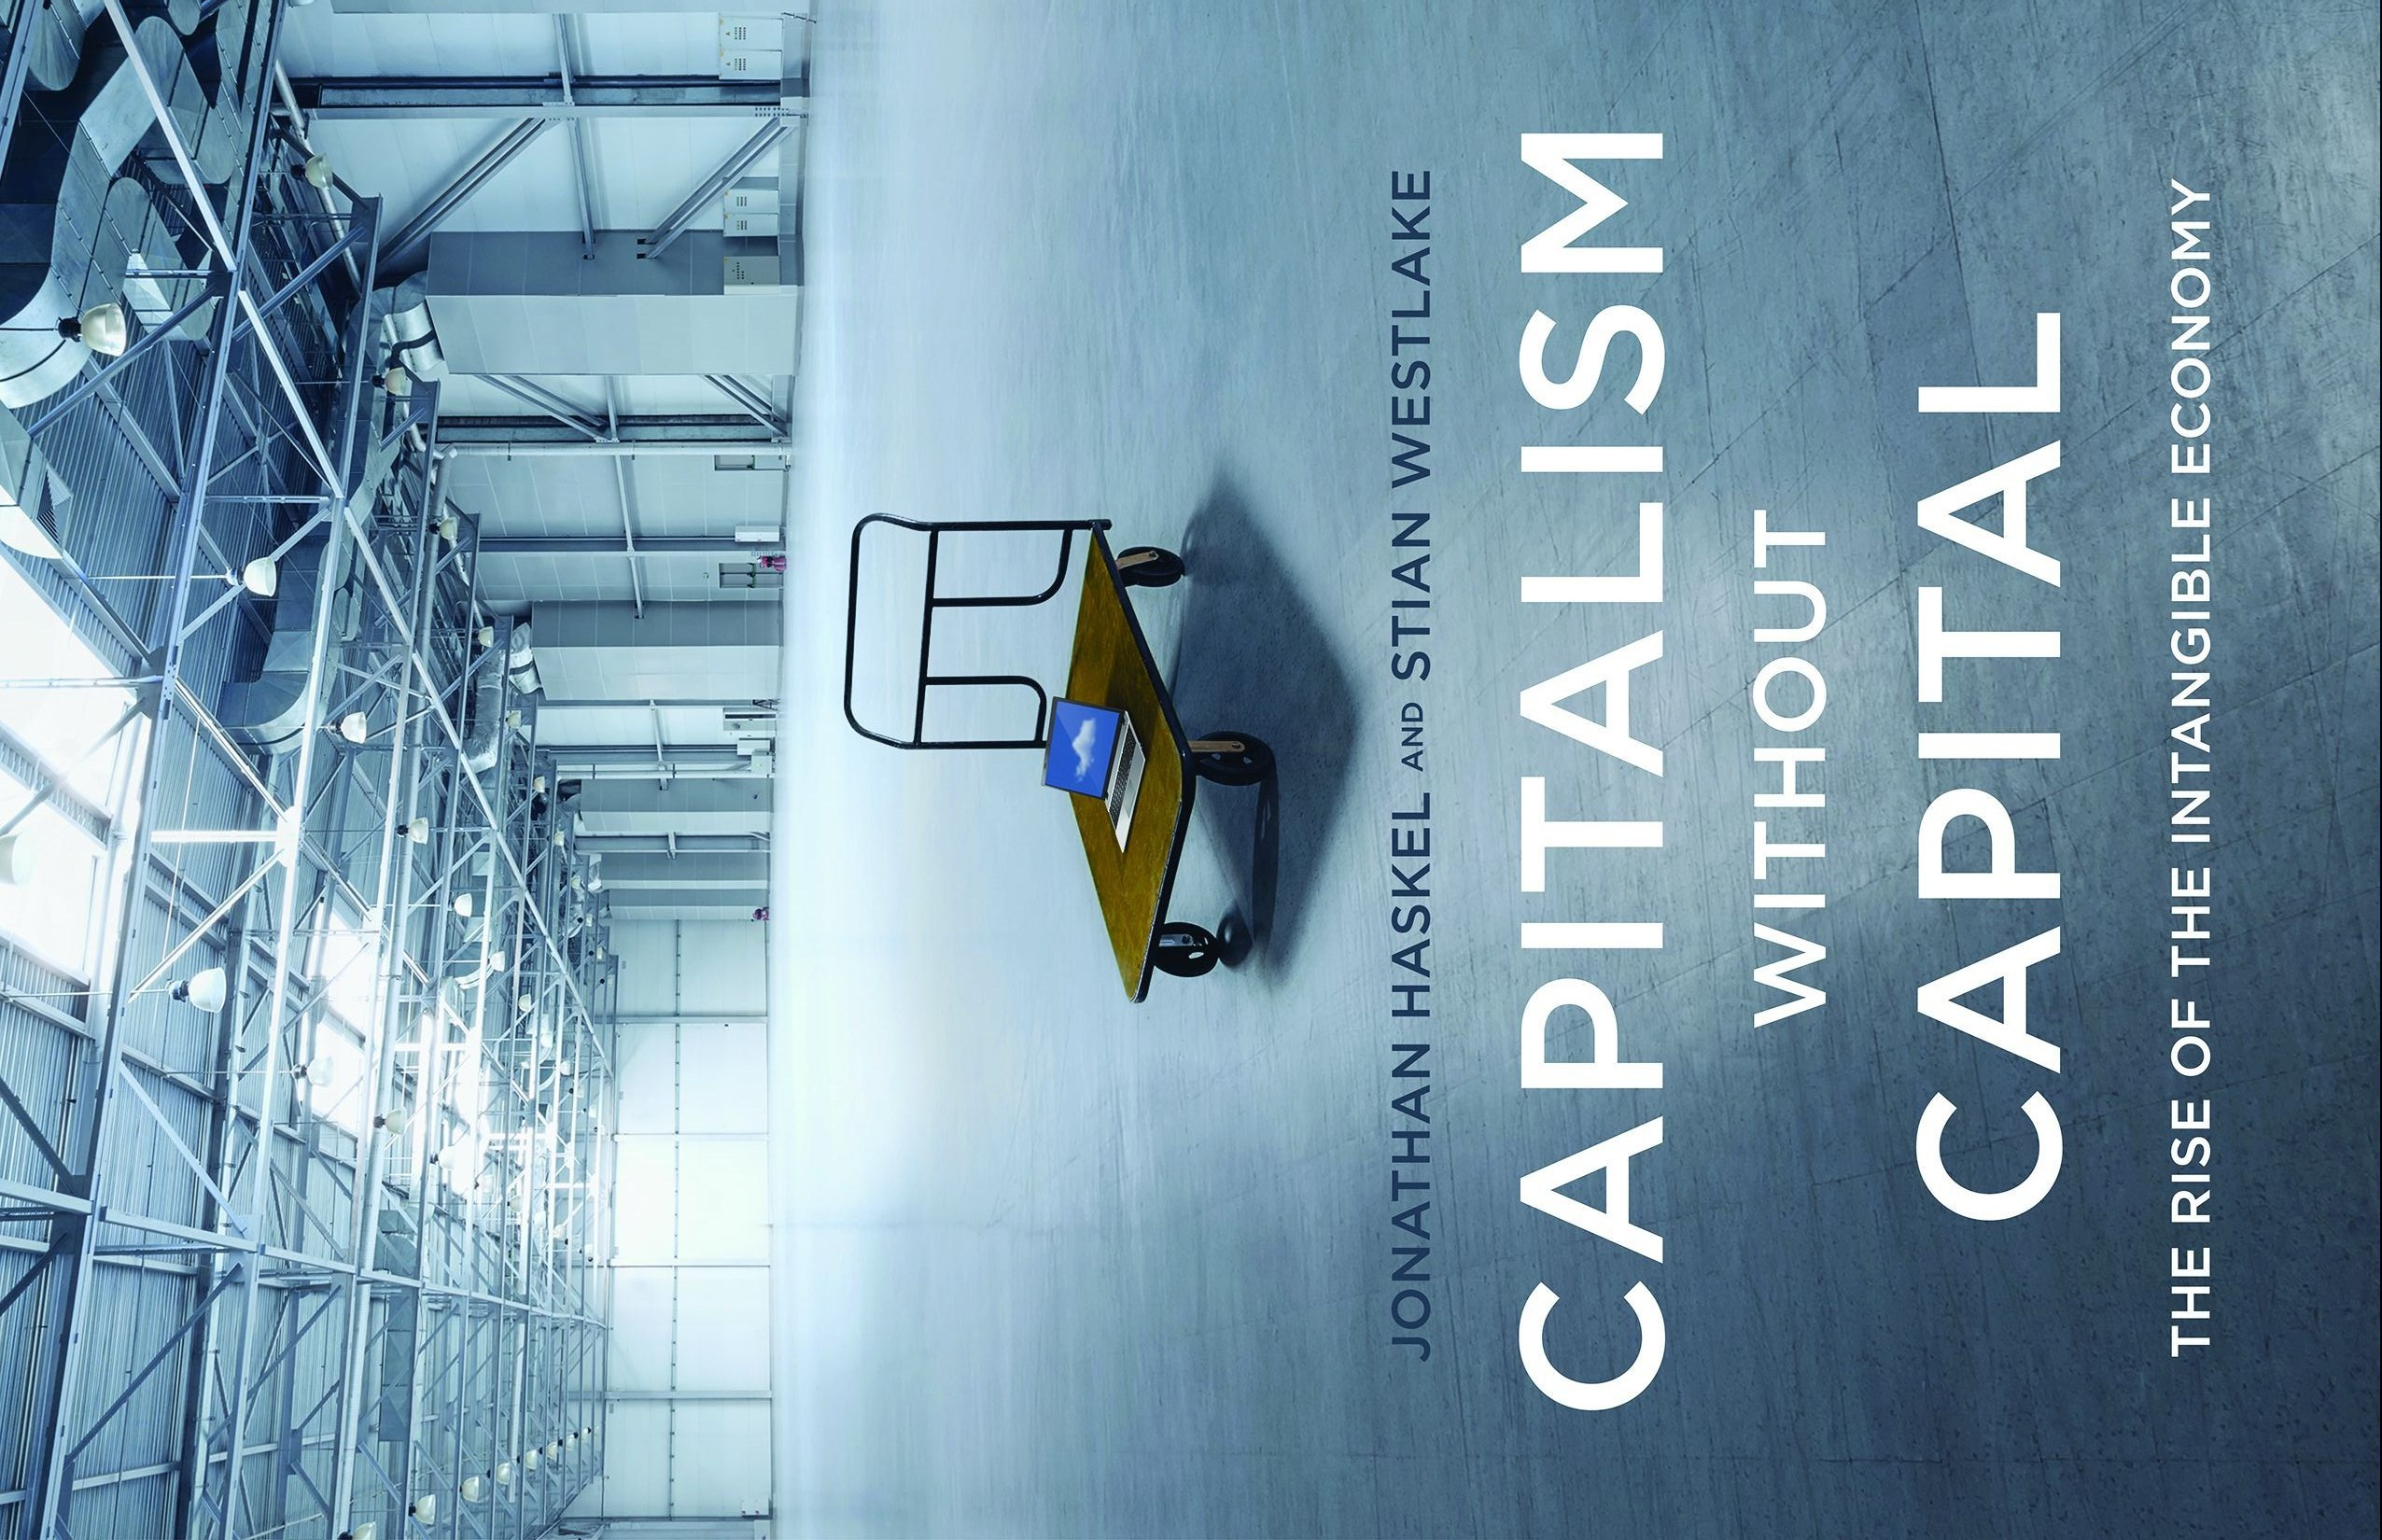 Libro: Capitalismo senza capitale.